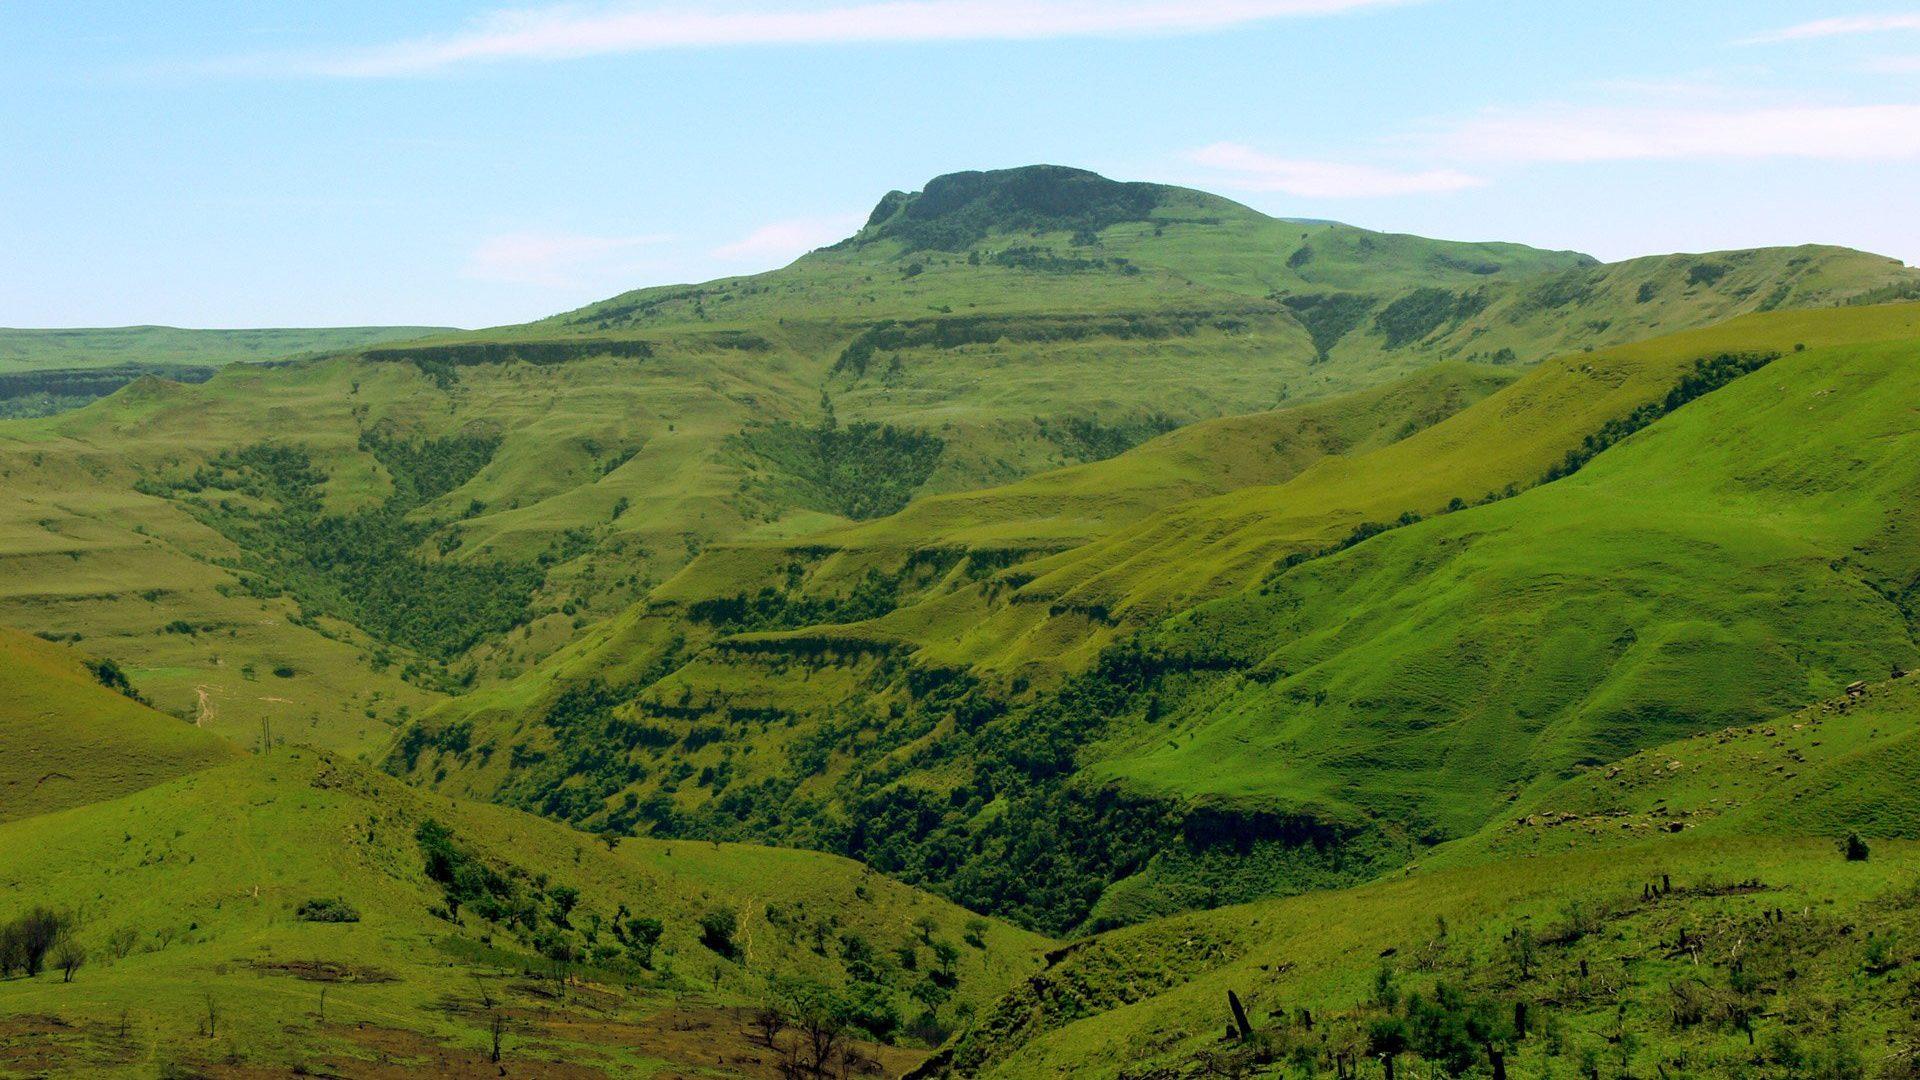 Valley of 1000 Hills